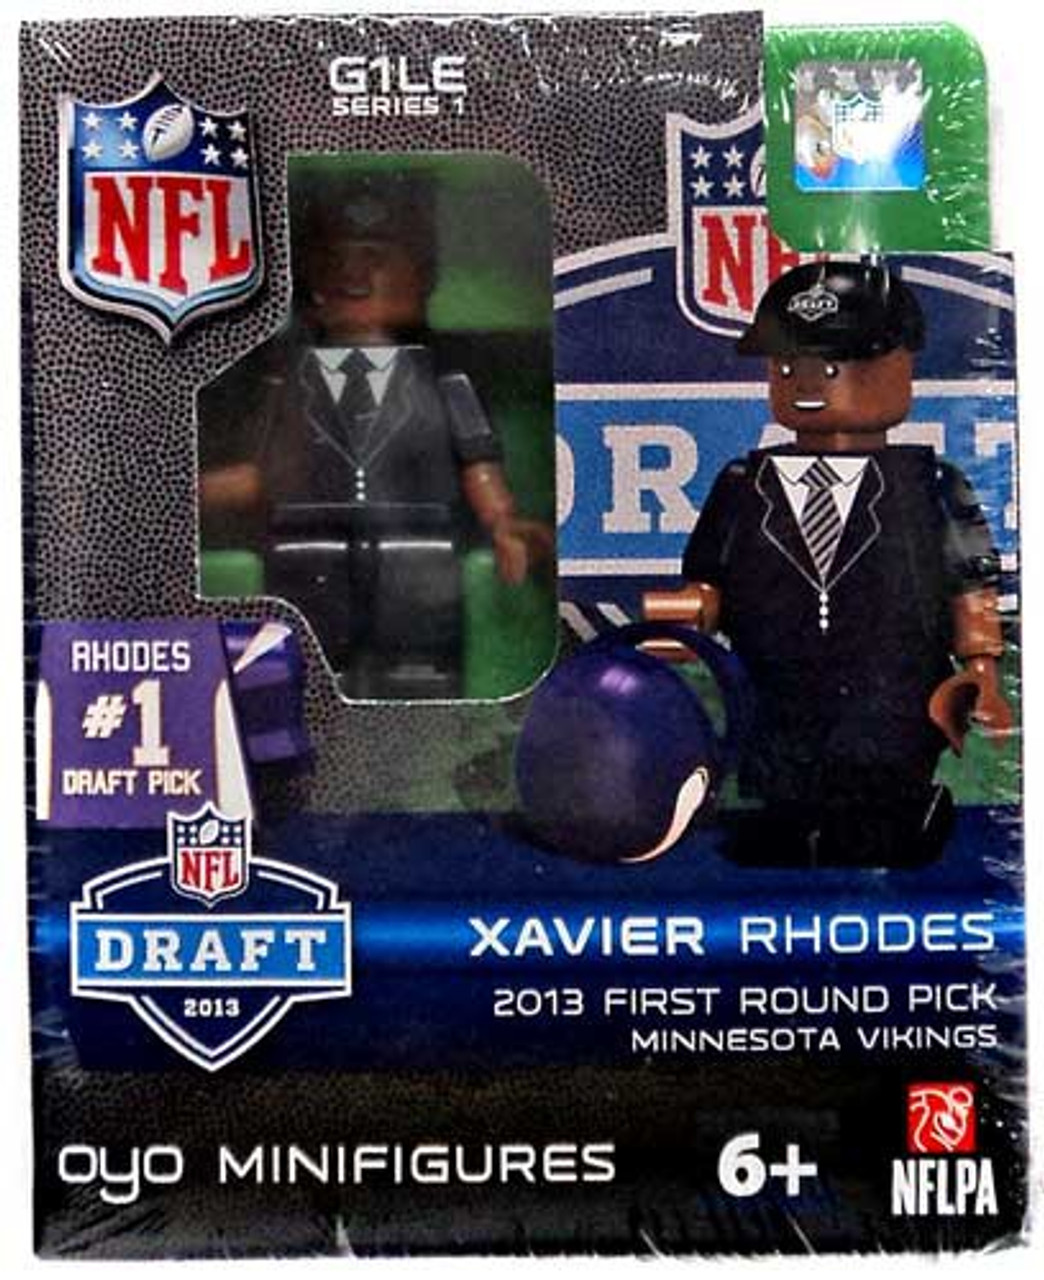 Minnesota Vikings NFL 2013 Draft First Round Picks Xavier Rhodes Minifigure